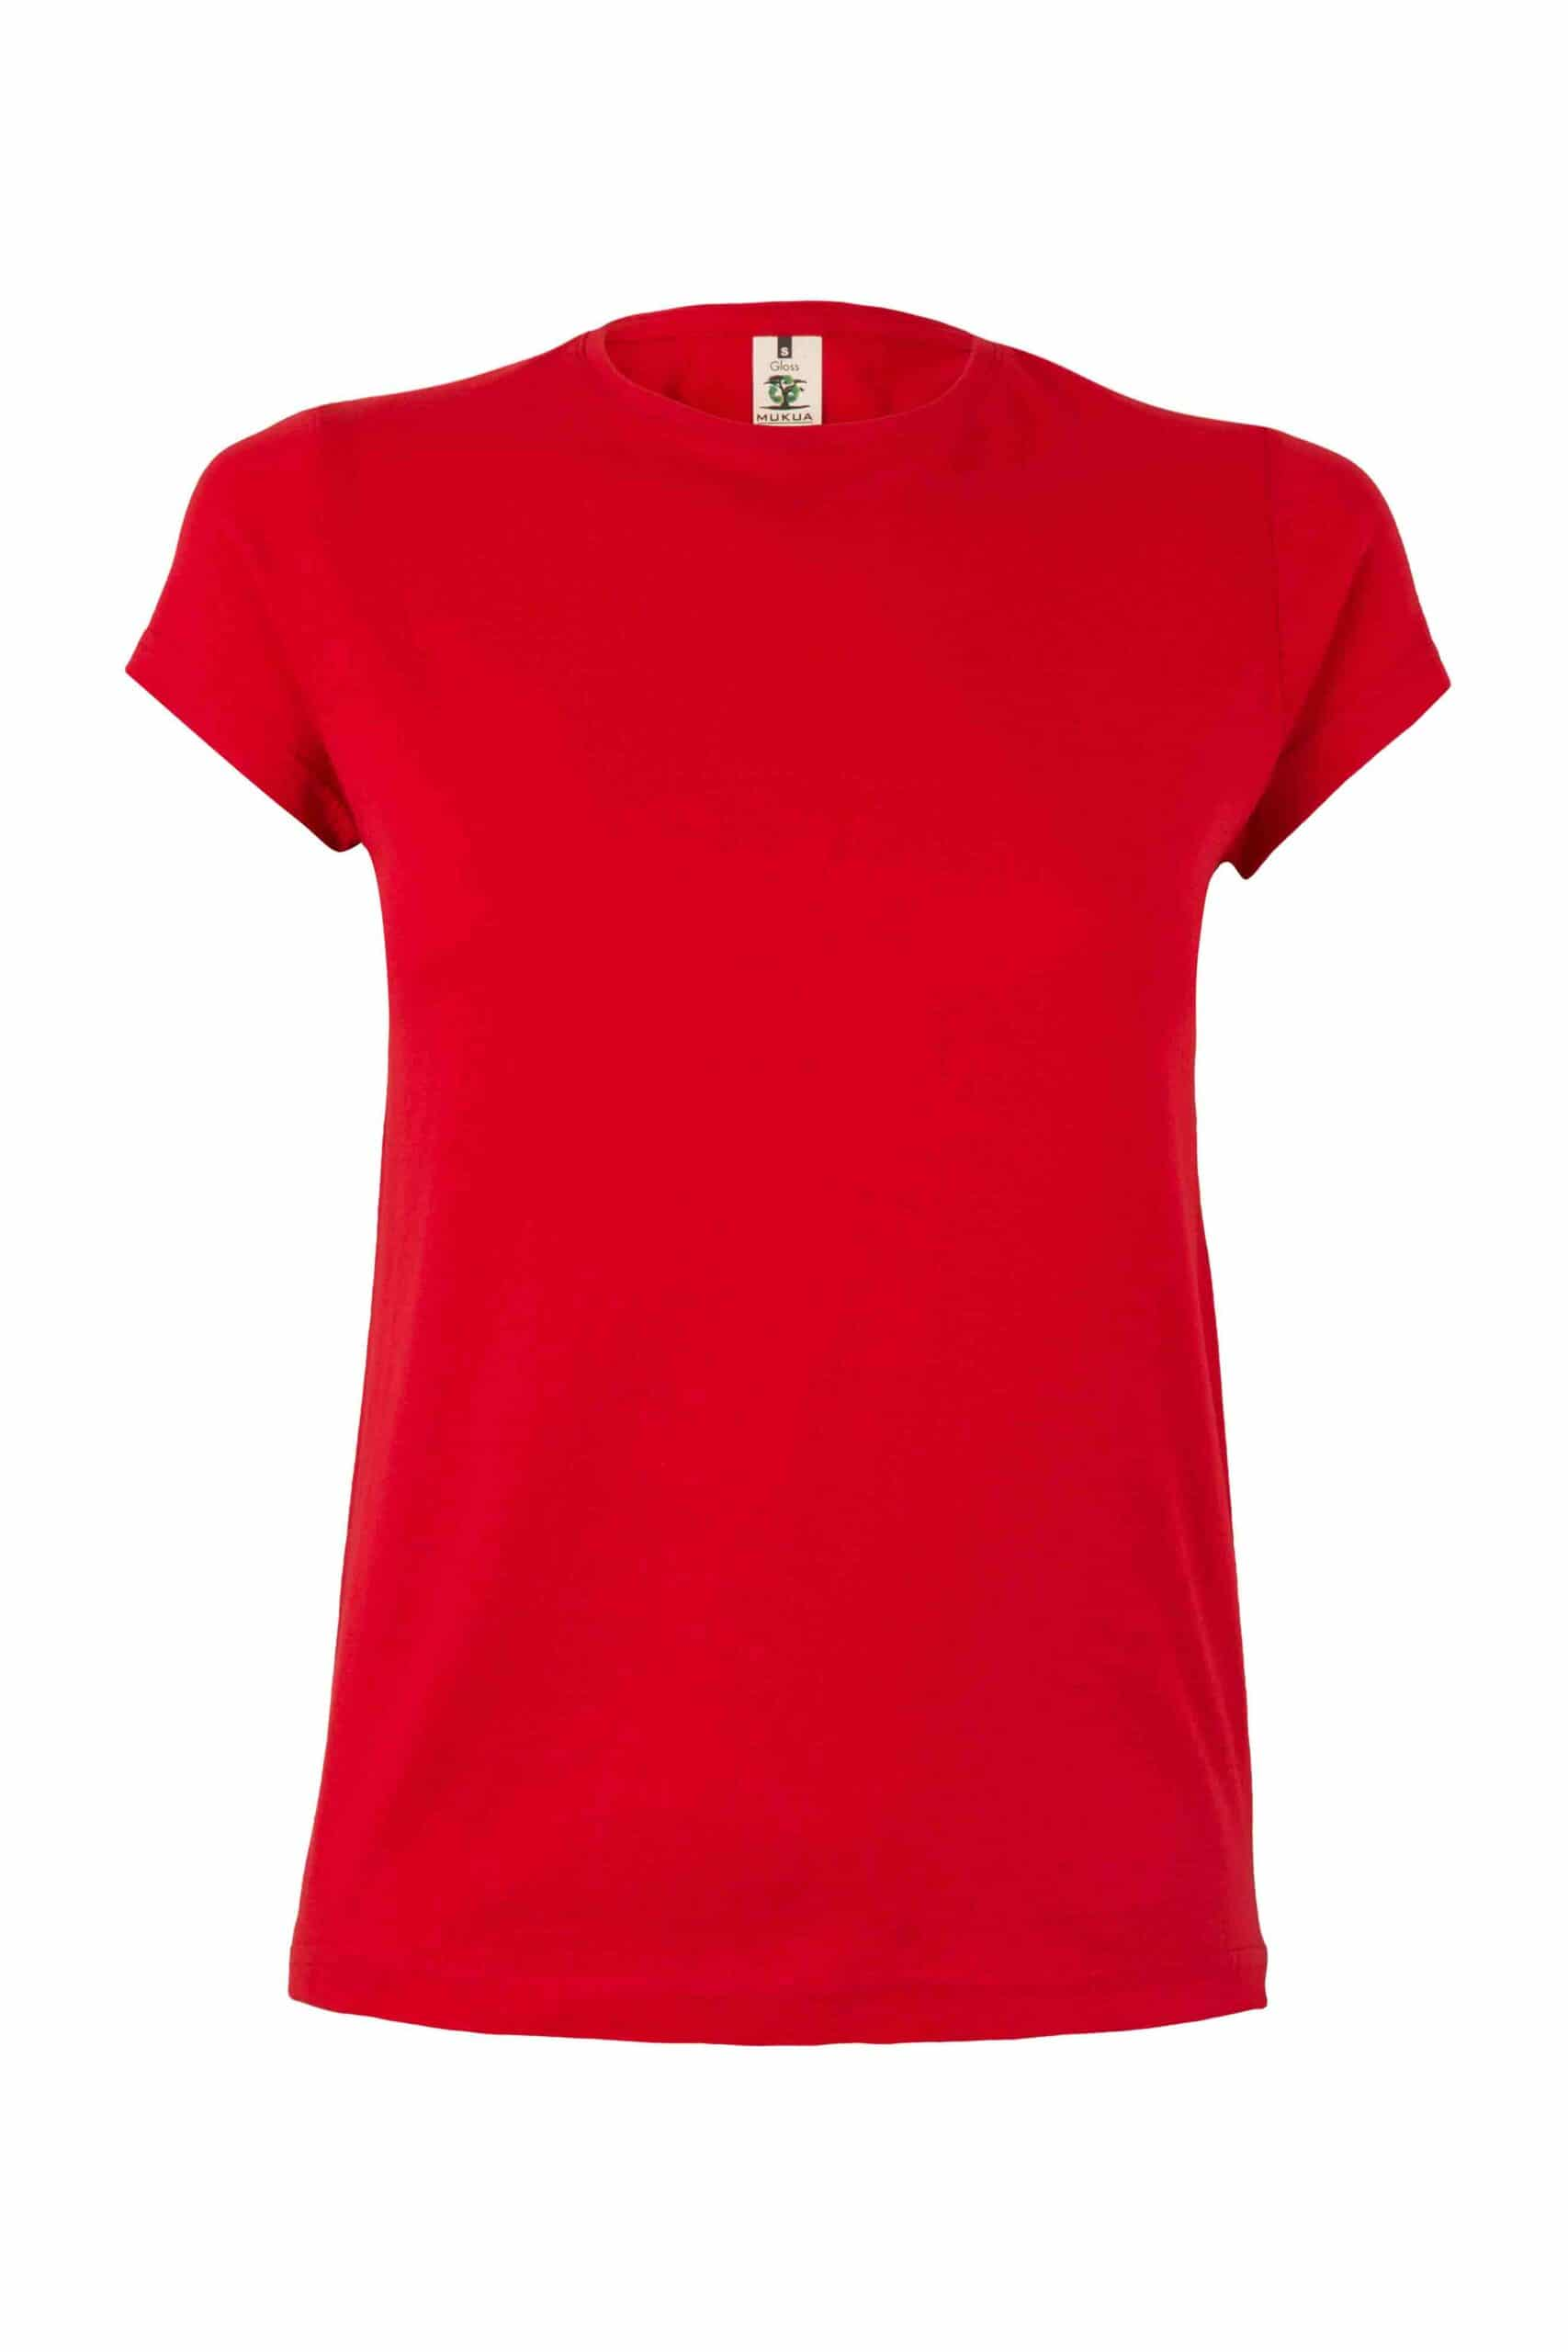 Mukua Mk170cv Camiseta Manga Corta 130gr Red